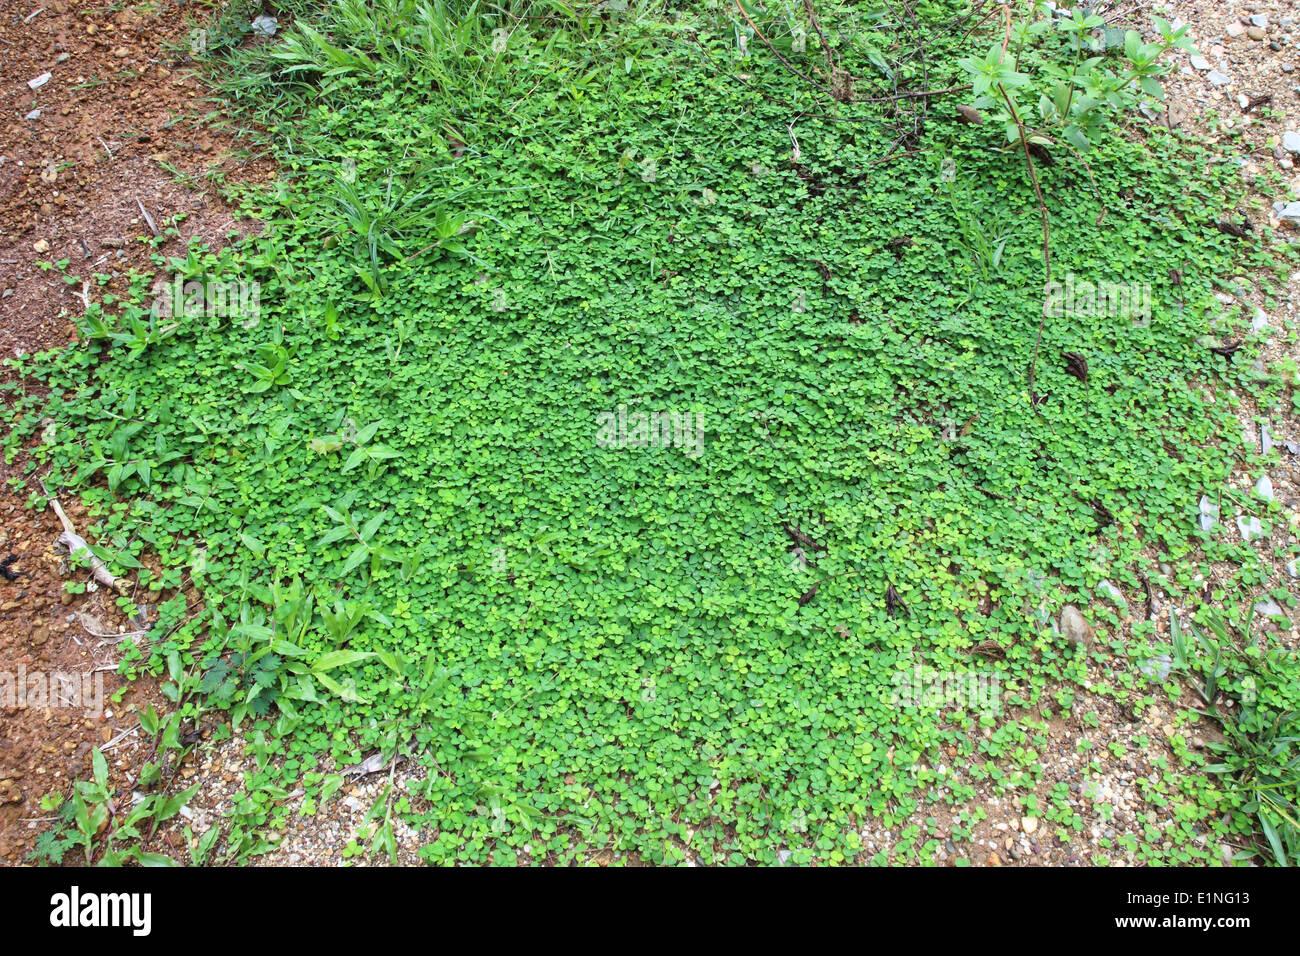 Grasgrün Hintergründe Stockbild